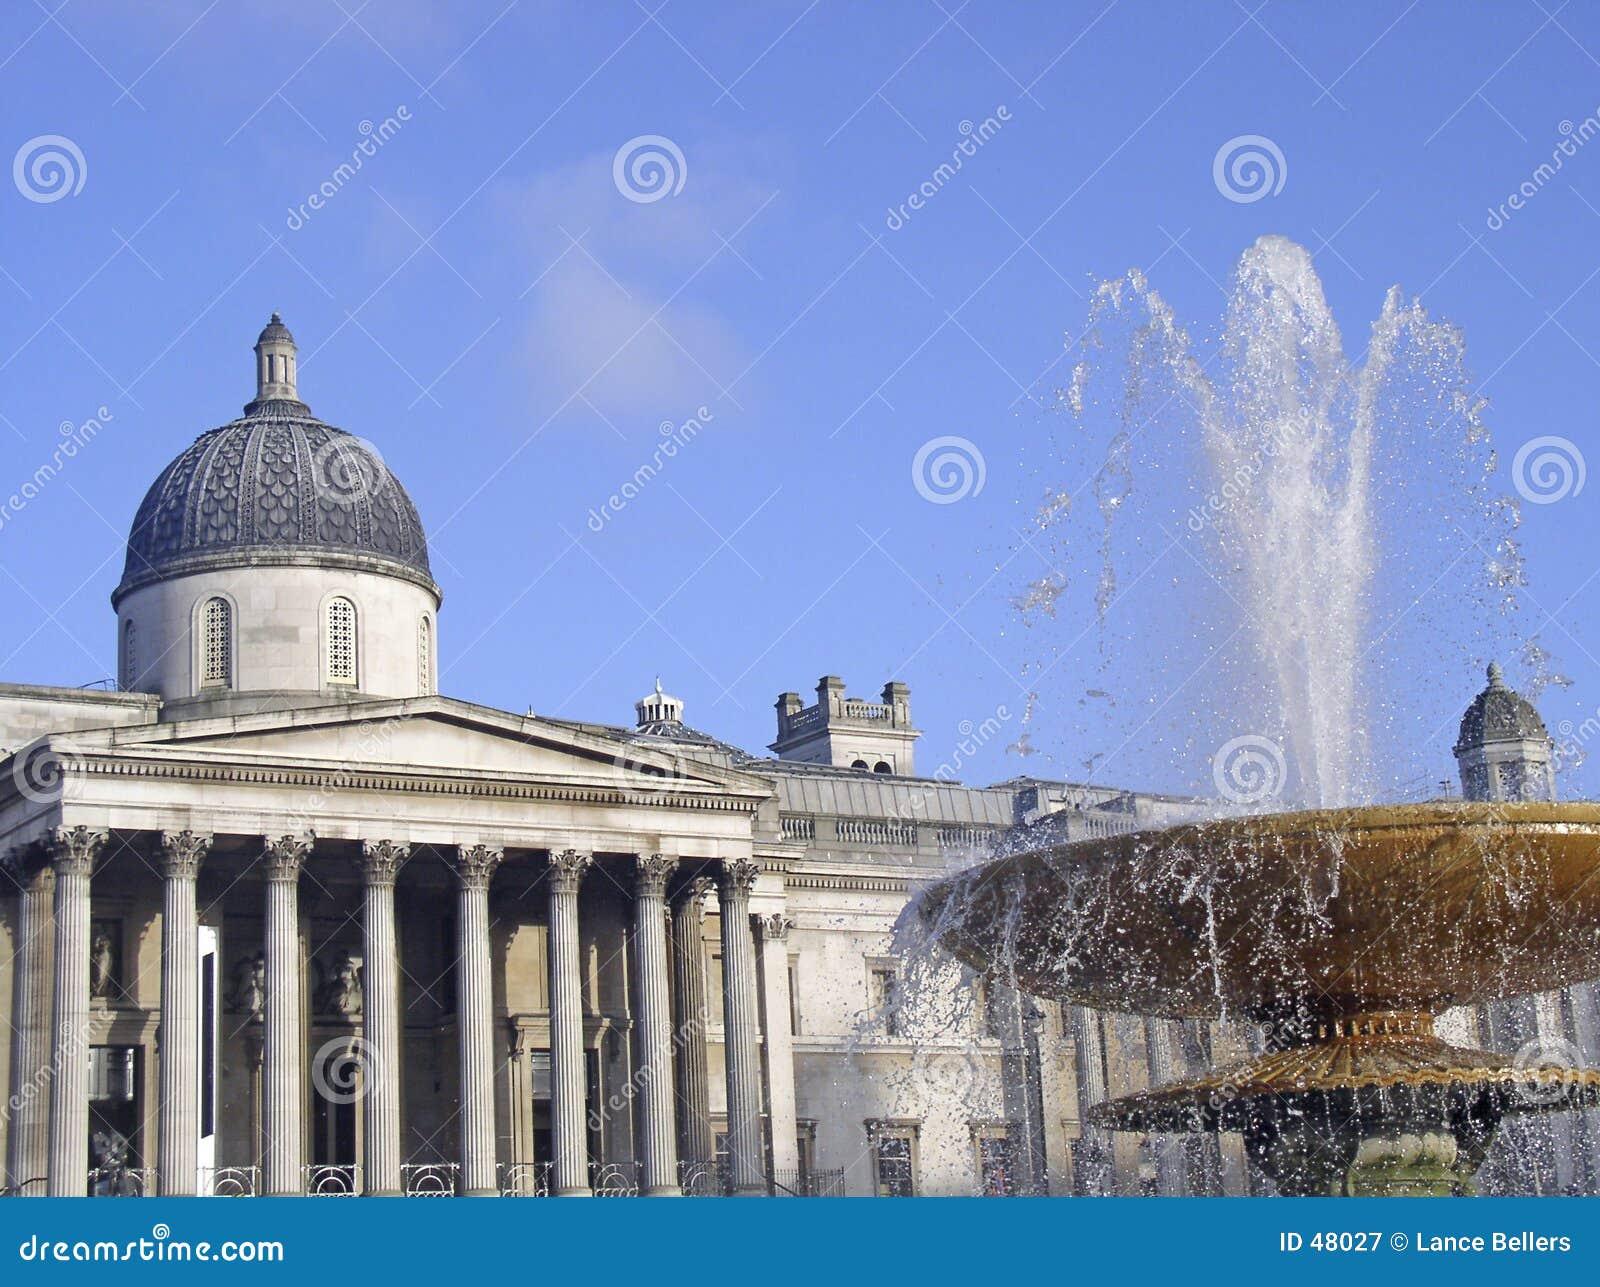 Galeria krajowych trafalgar square